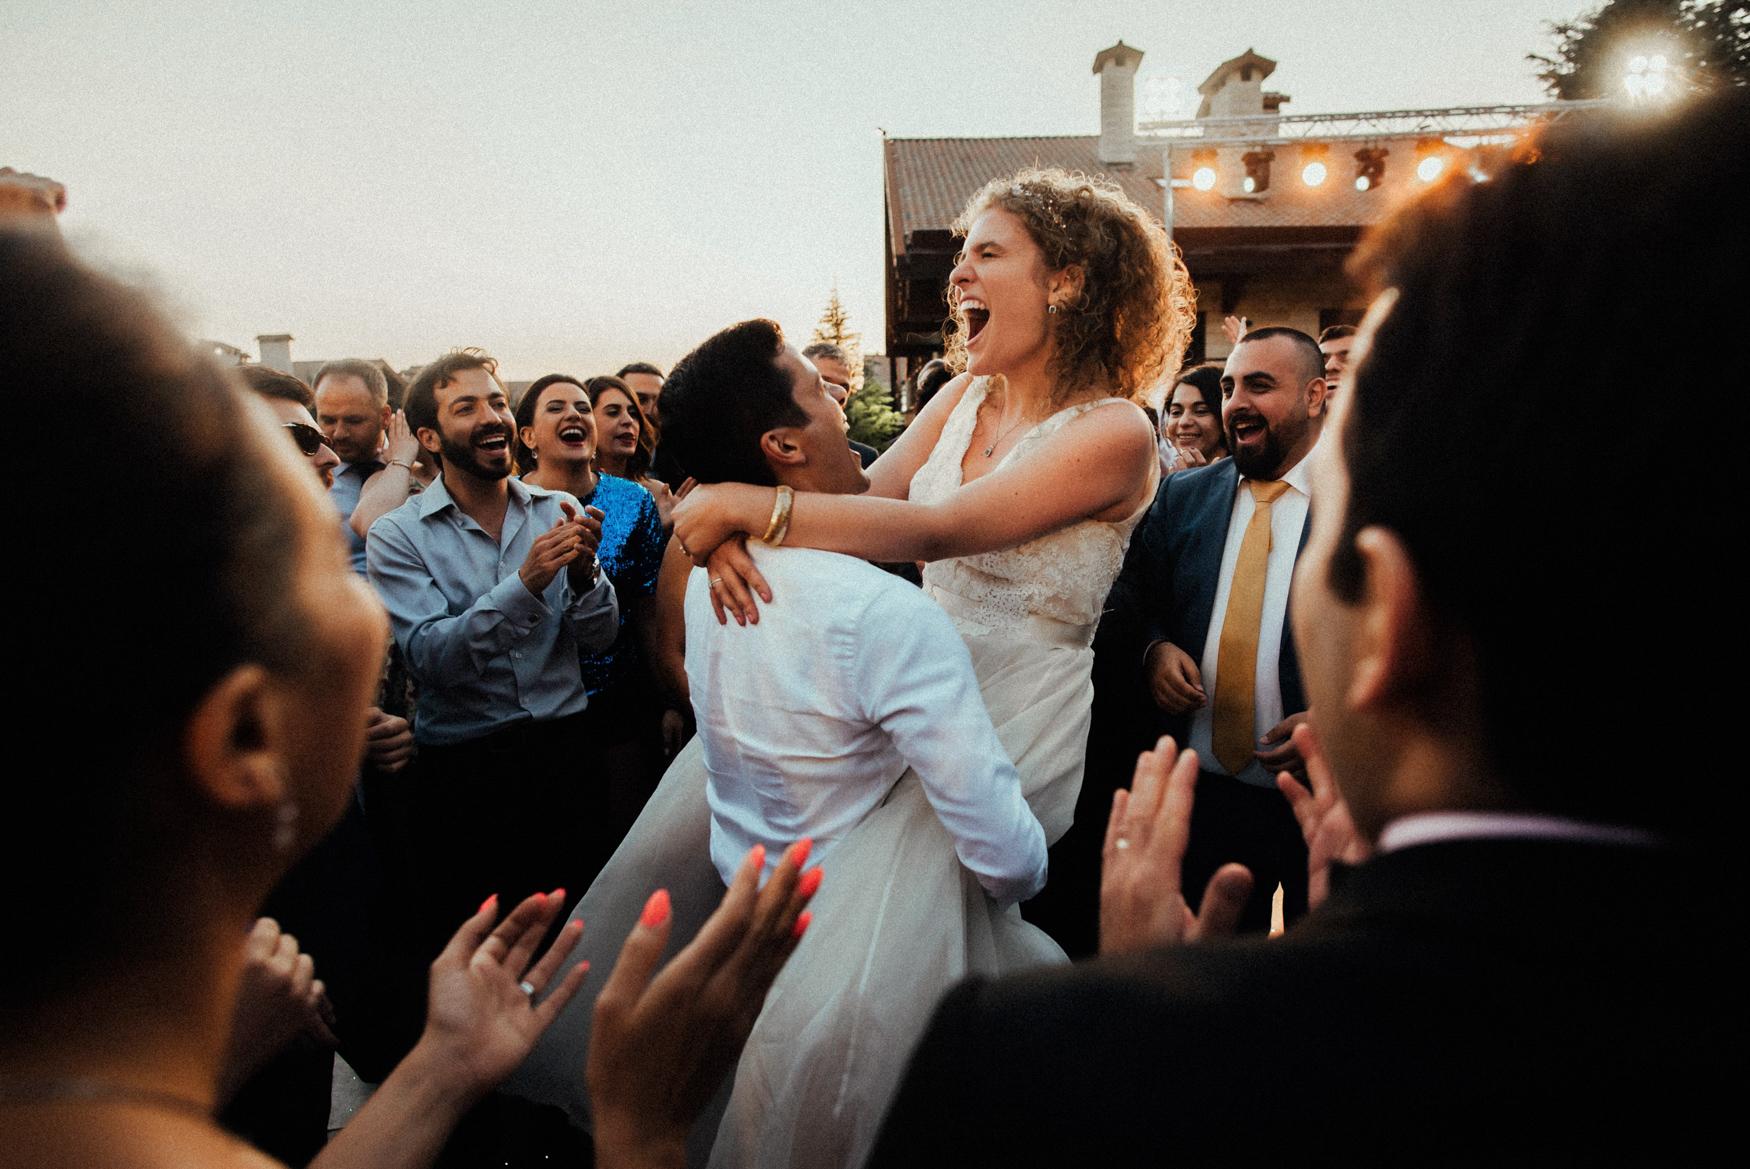 LR5 beirut lebanon mzaar intercontinental wedding photographer 025.jpg